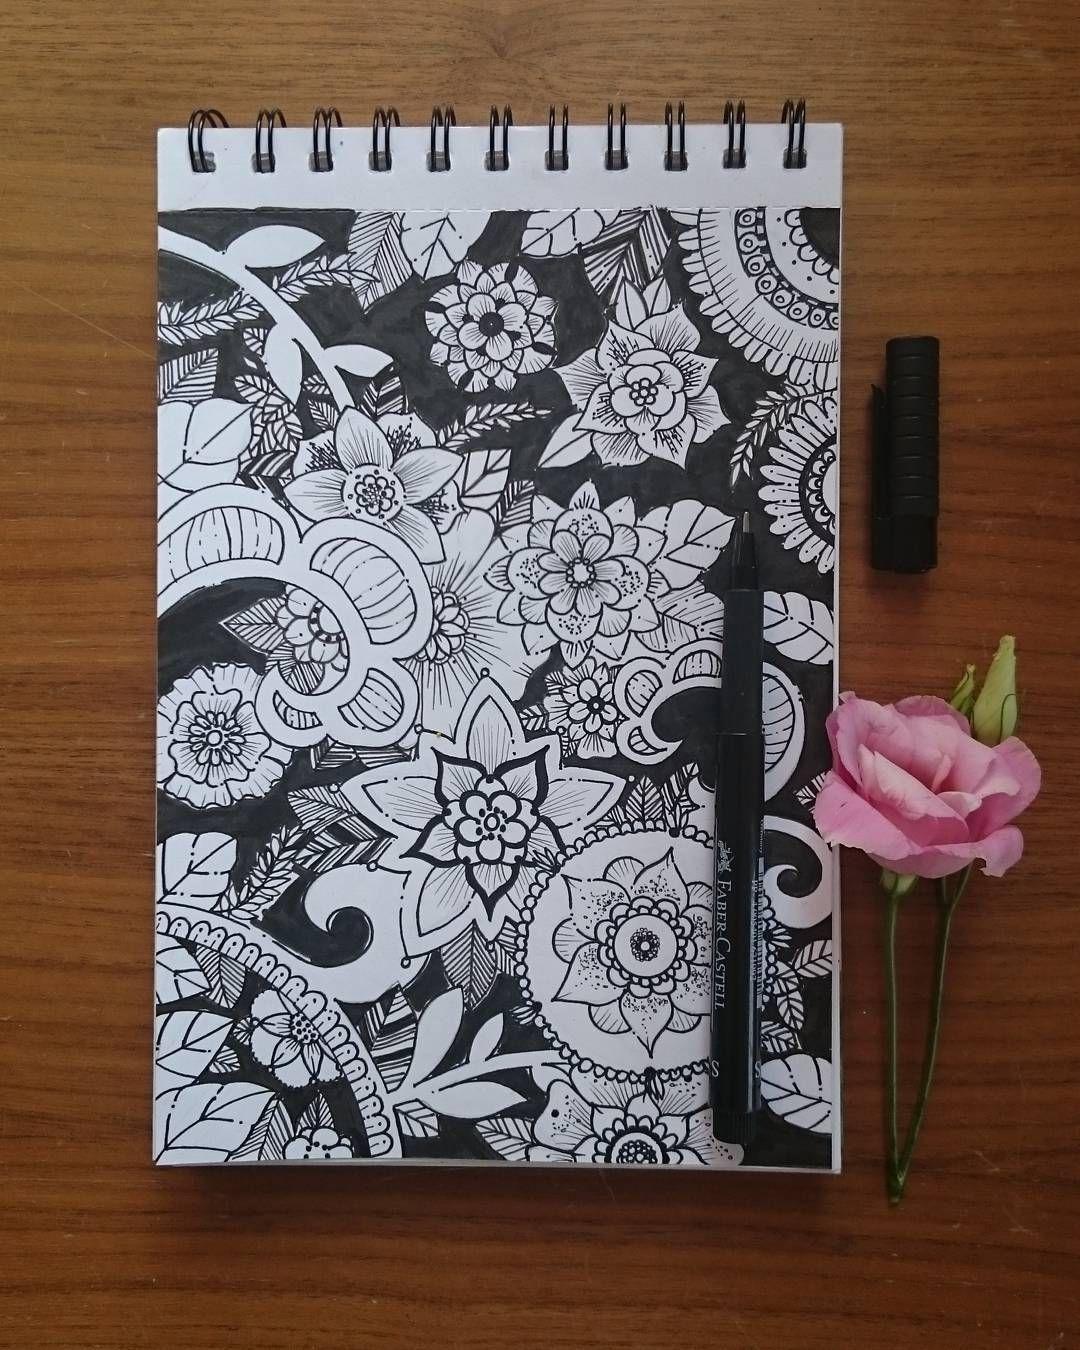 Good morning flowers... #art #kunst #draw #drawing #zeichnung #ink #blackandwhite #schwarzweiss #illustration #illustrations #flowers #blumen #artdaily2016 #artcollective #artdaily